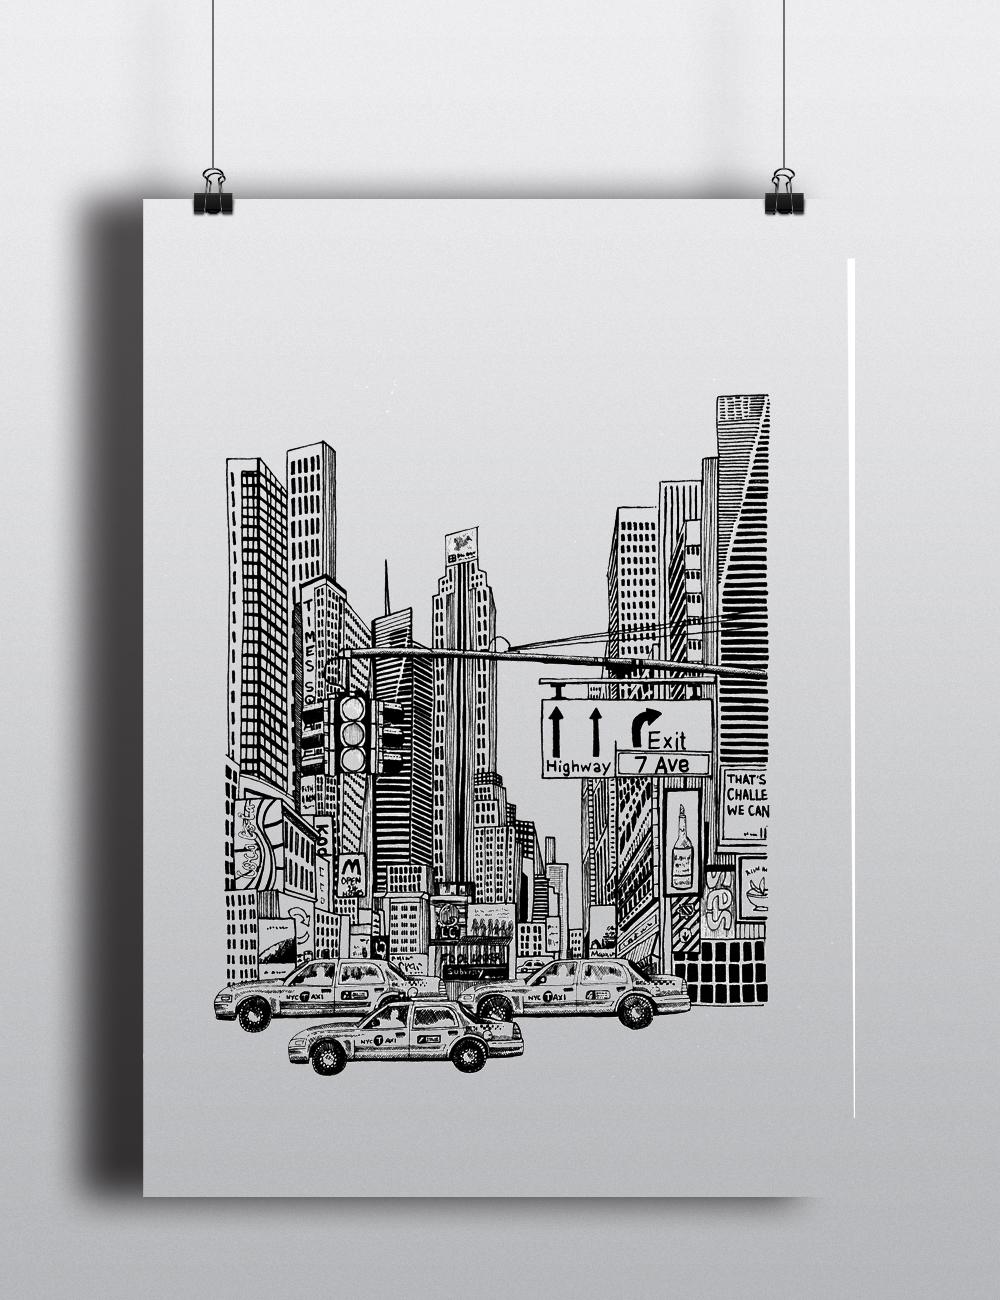 Times square nyc digital art print new york city illustration a4 a5